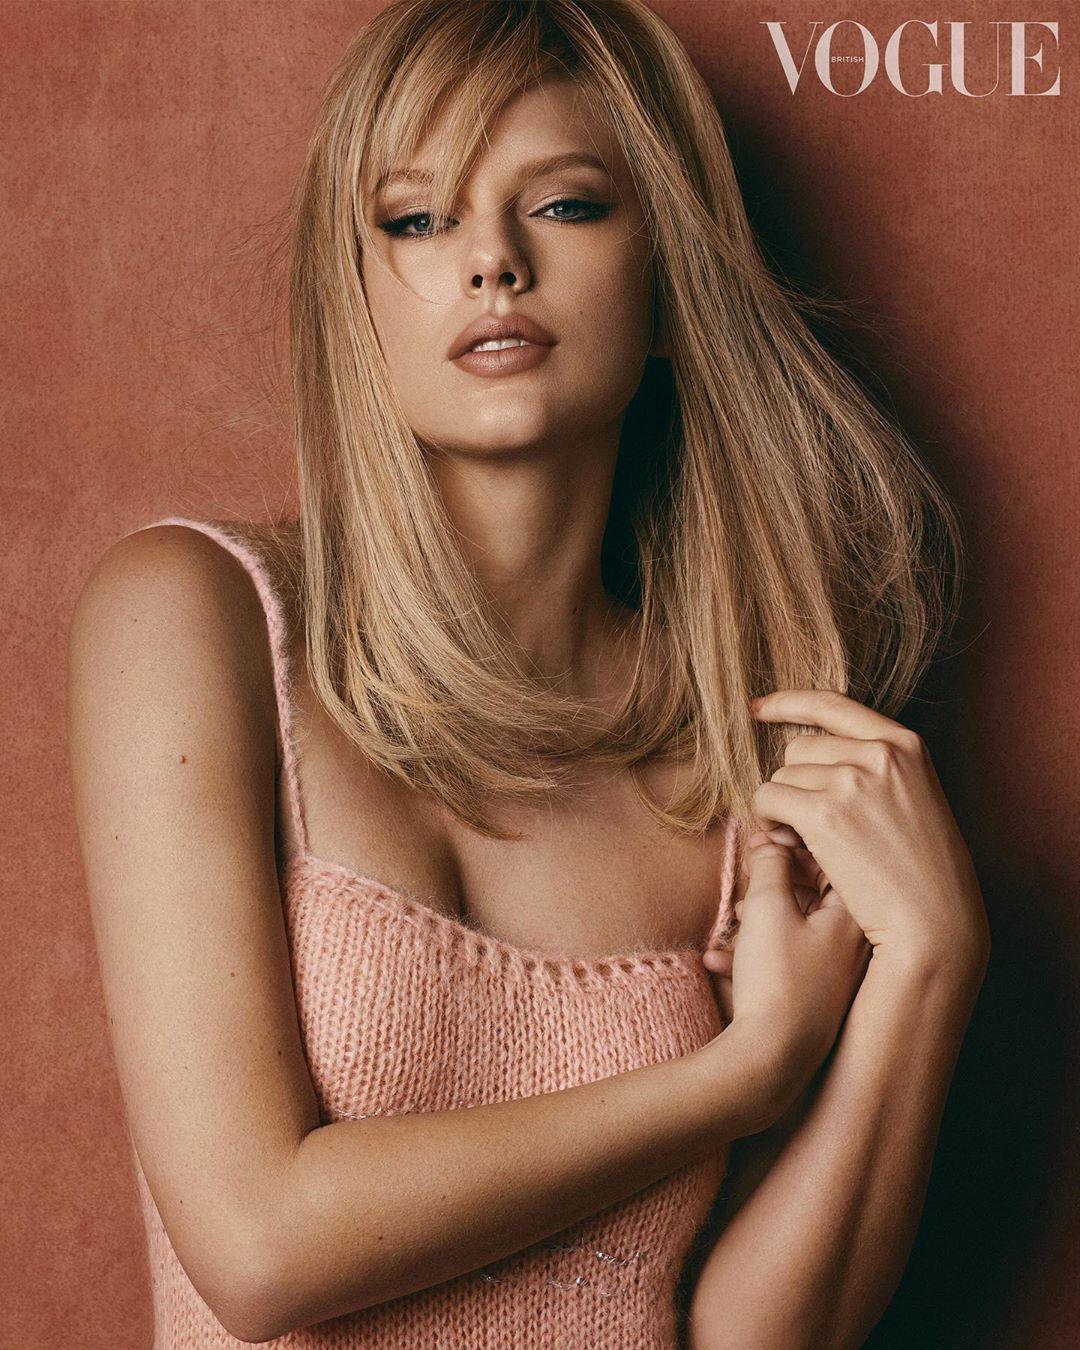 Тейлор Свіфт для Vogue_1